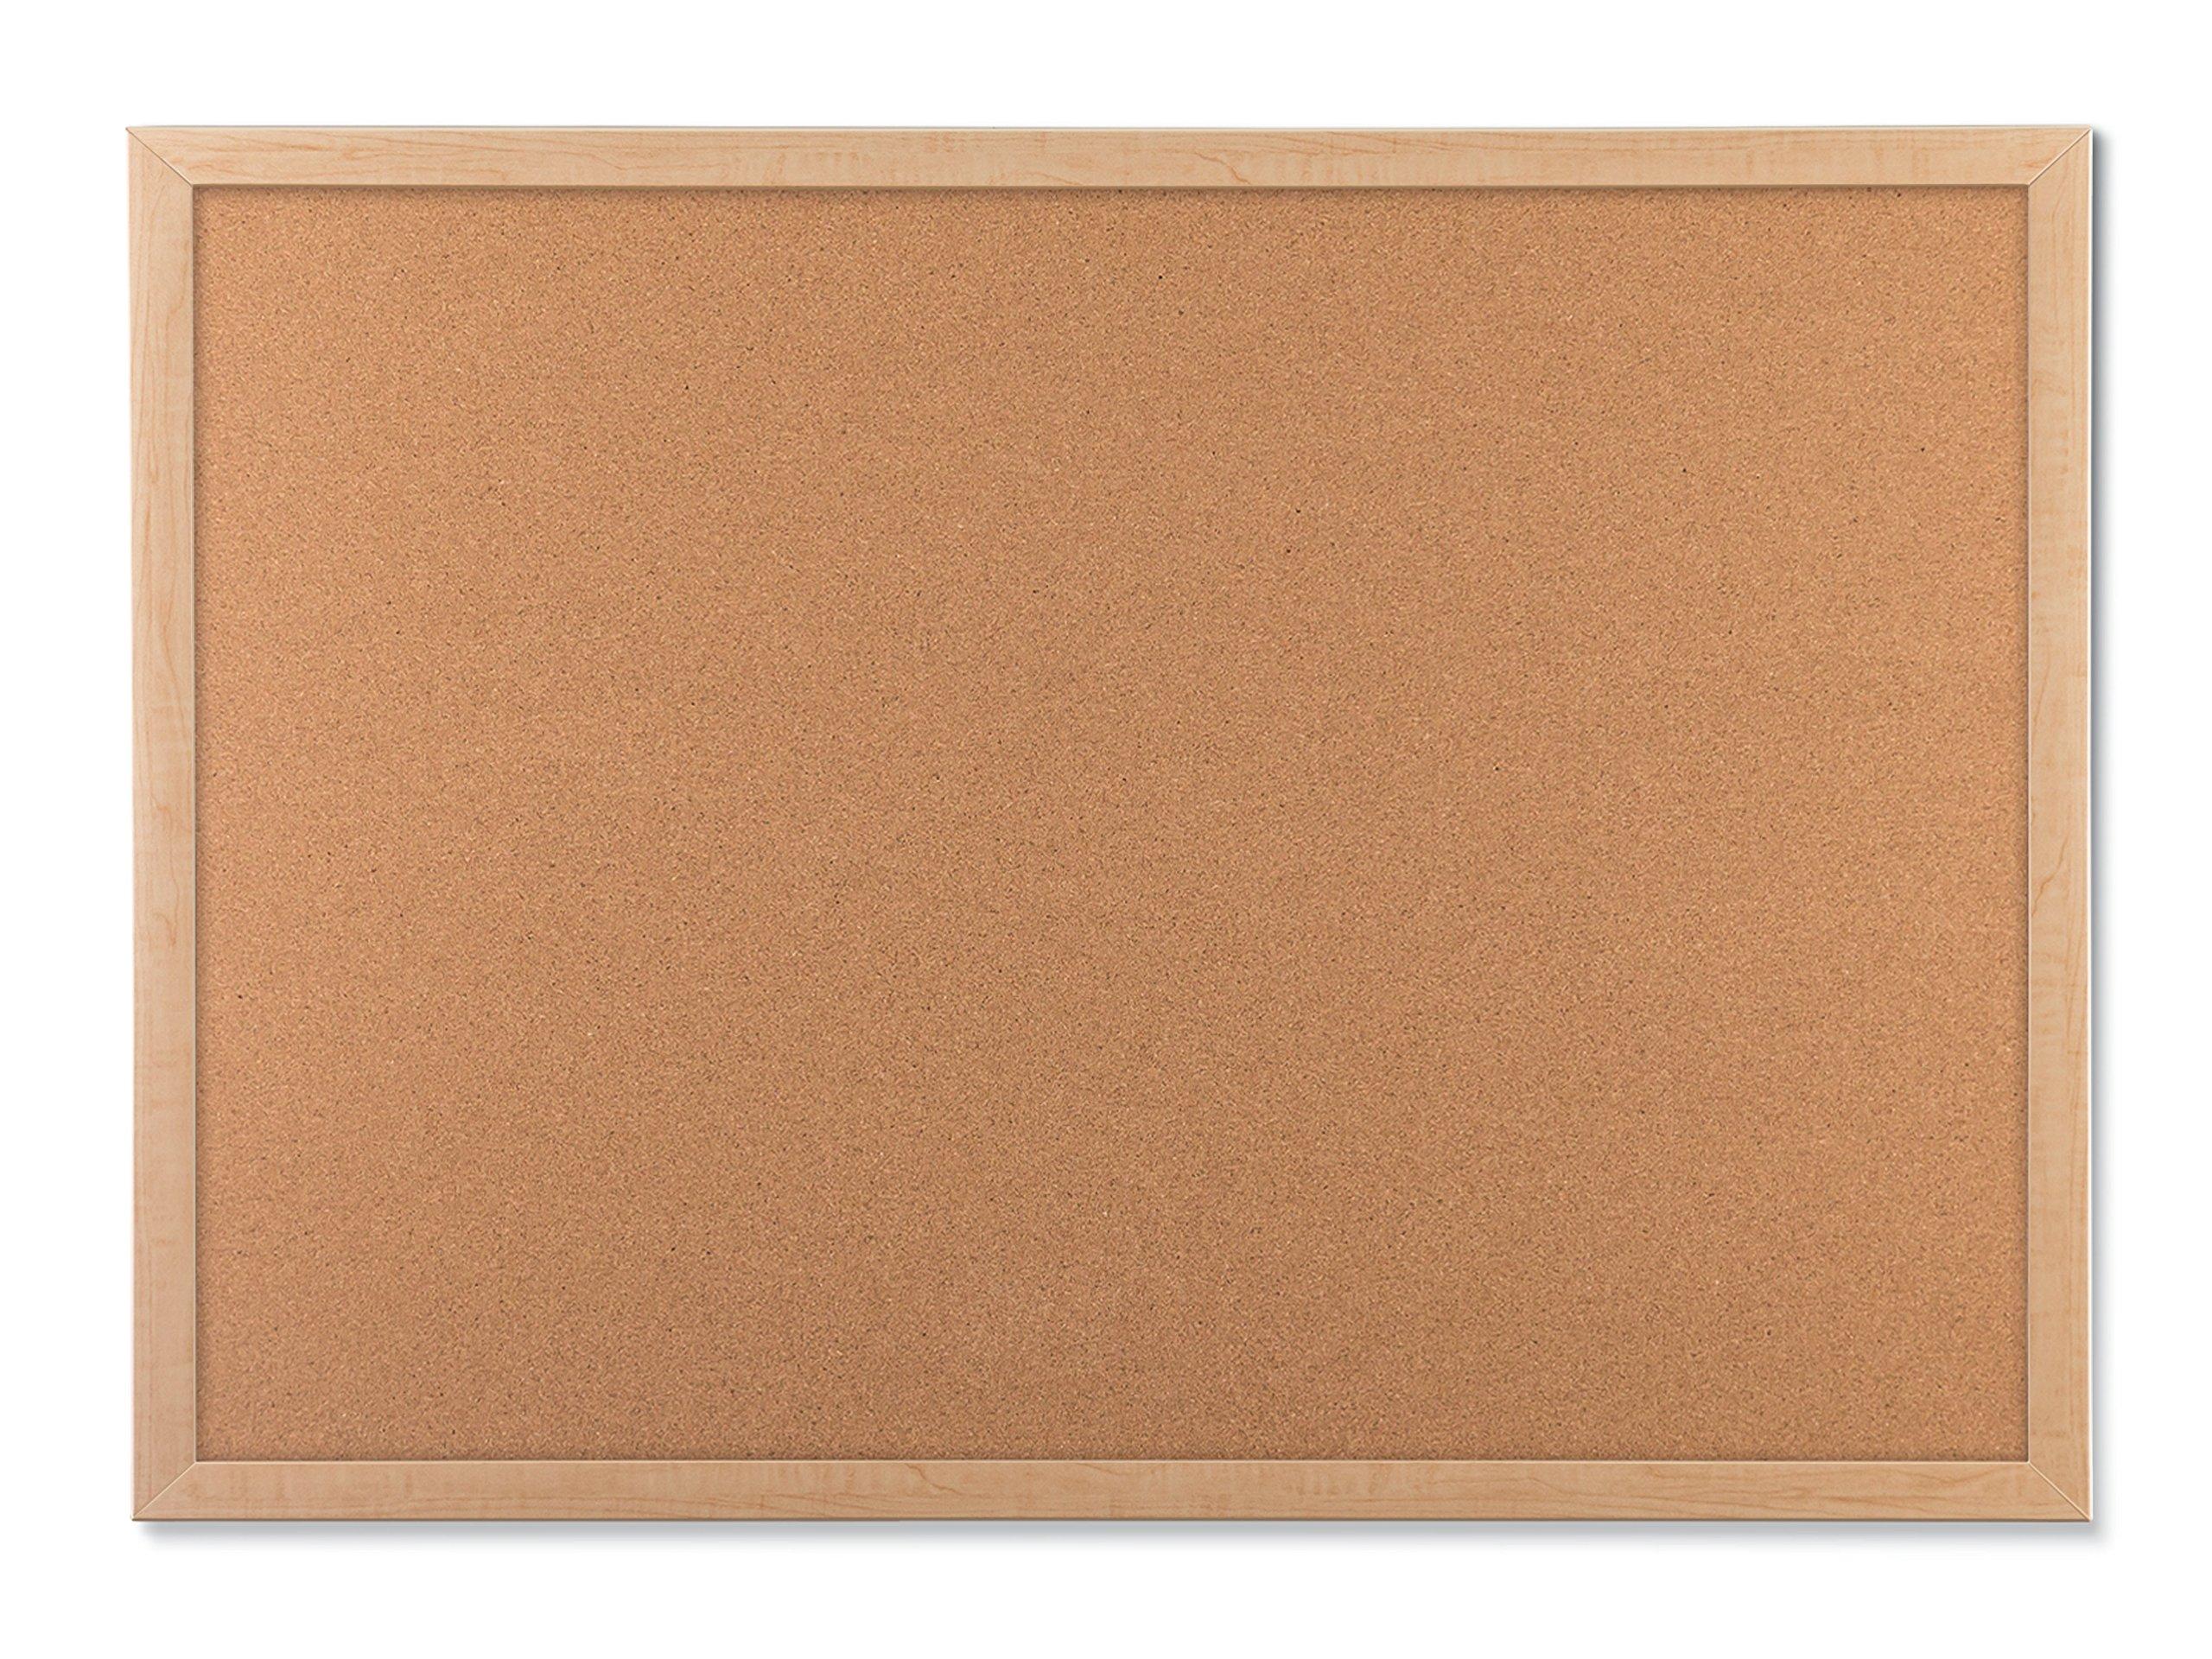 U Brands Cork Bulletin Board, 35 x 23 Inches, Light Birch Wood Frame